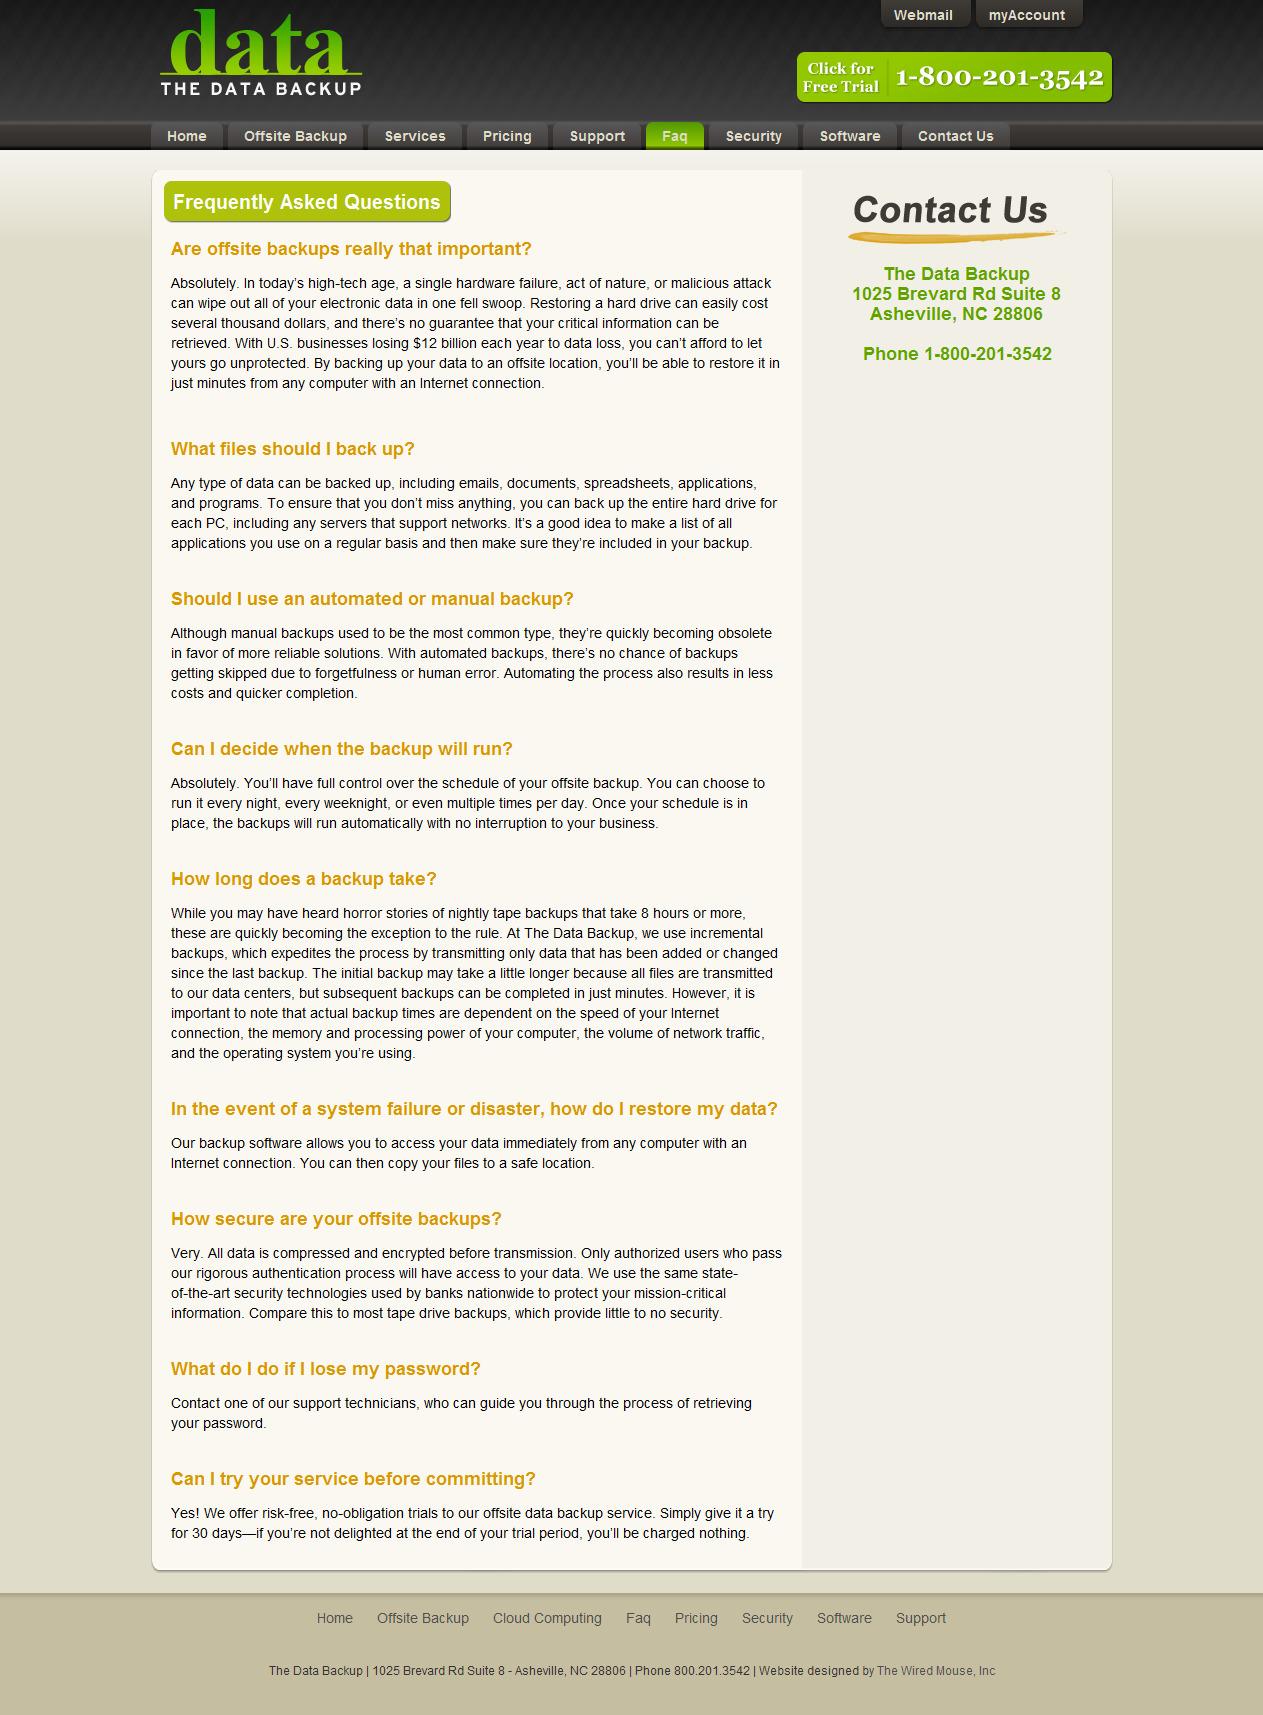 Web Content: Data Backups